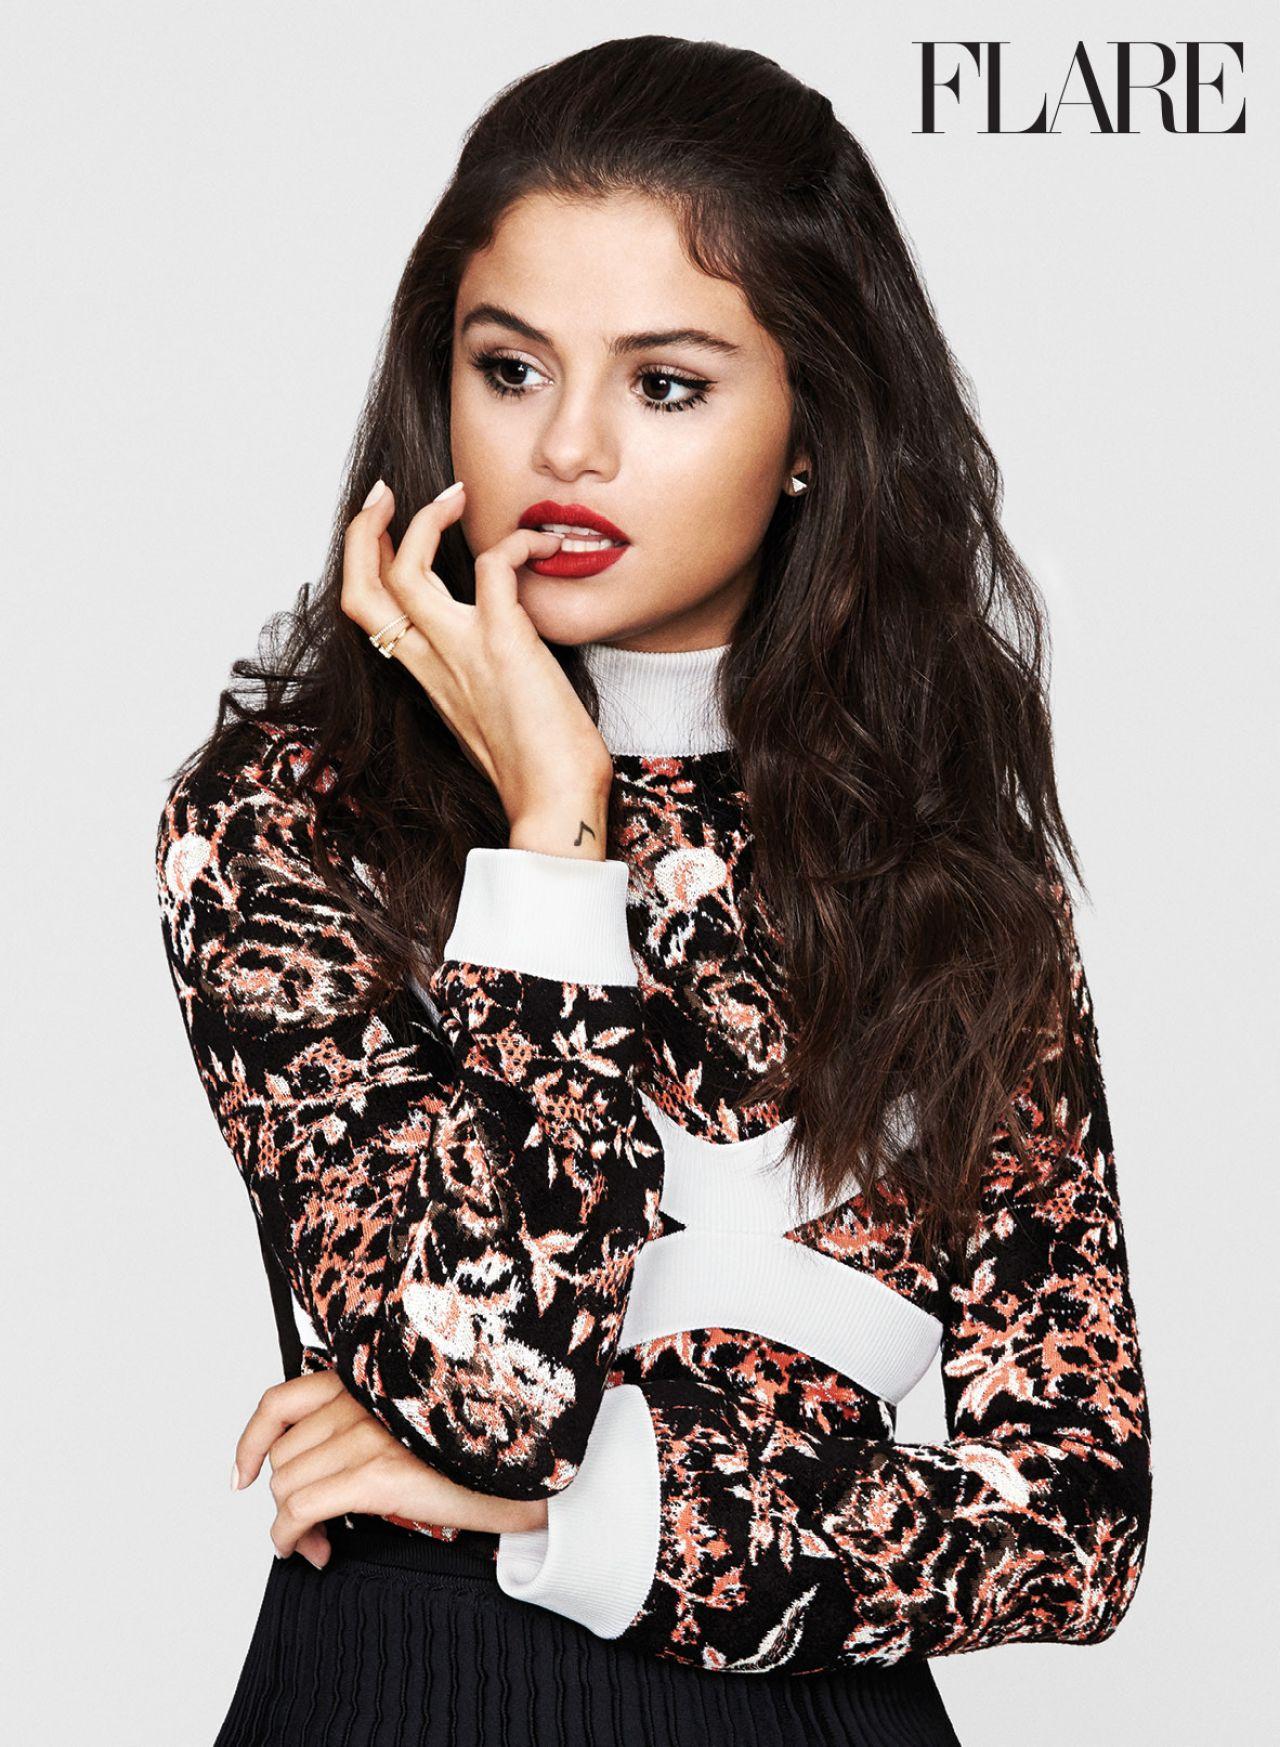 Selena Gomez – Flare Magazine November 2015 Issue